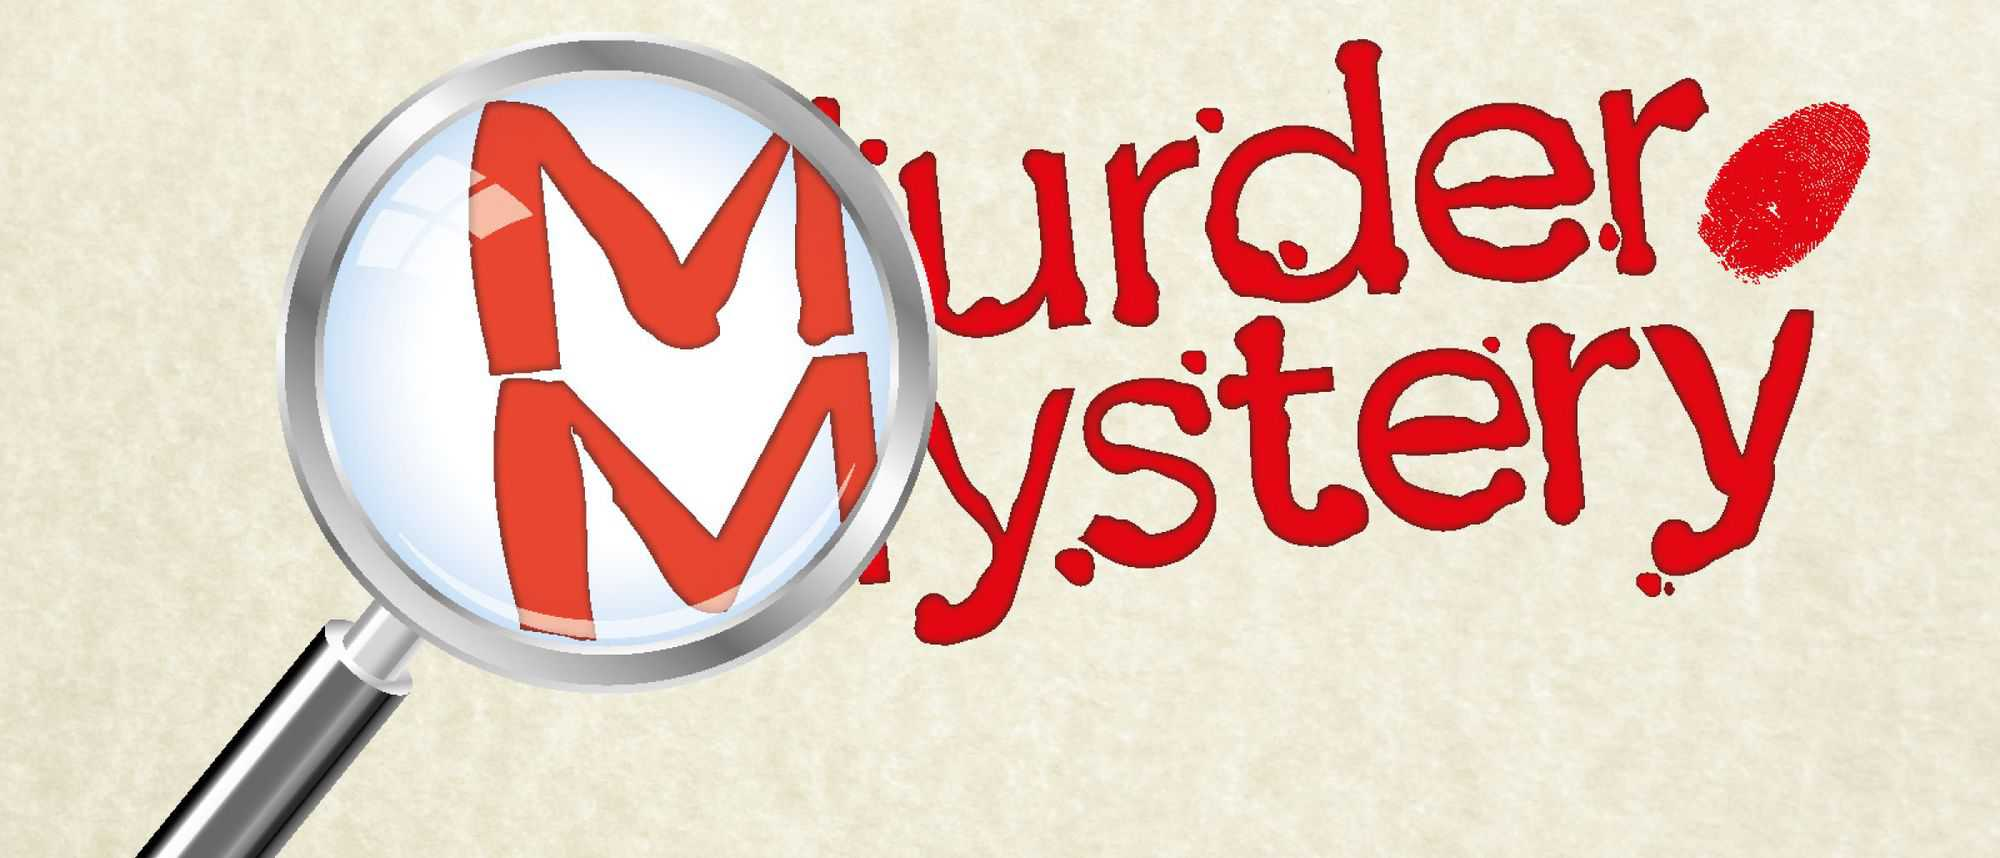 Murder Mystery Dinner Theater - Illinois River Road